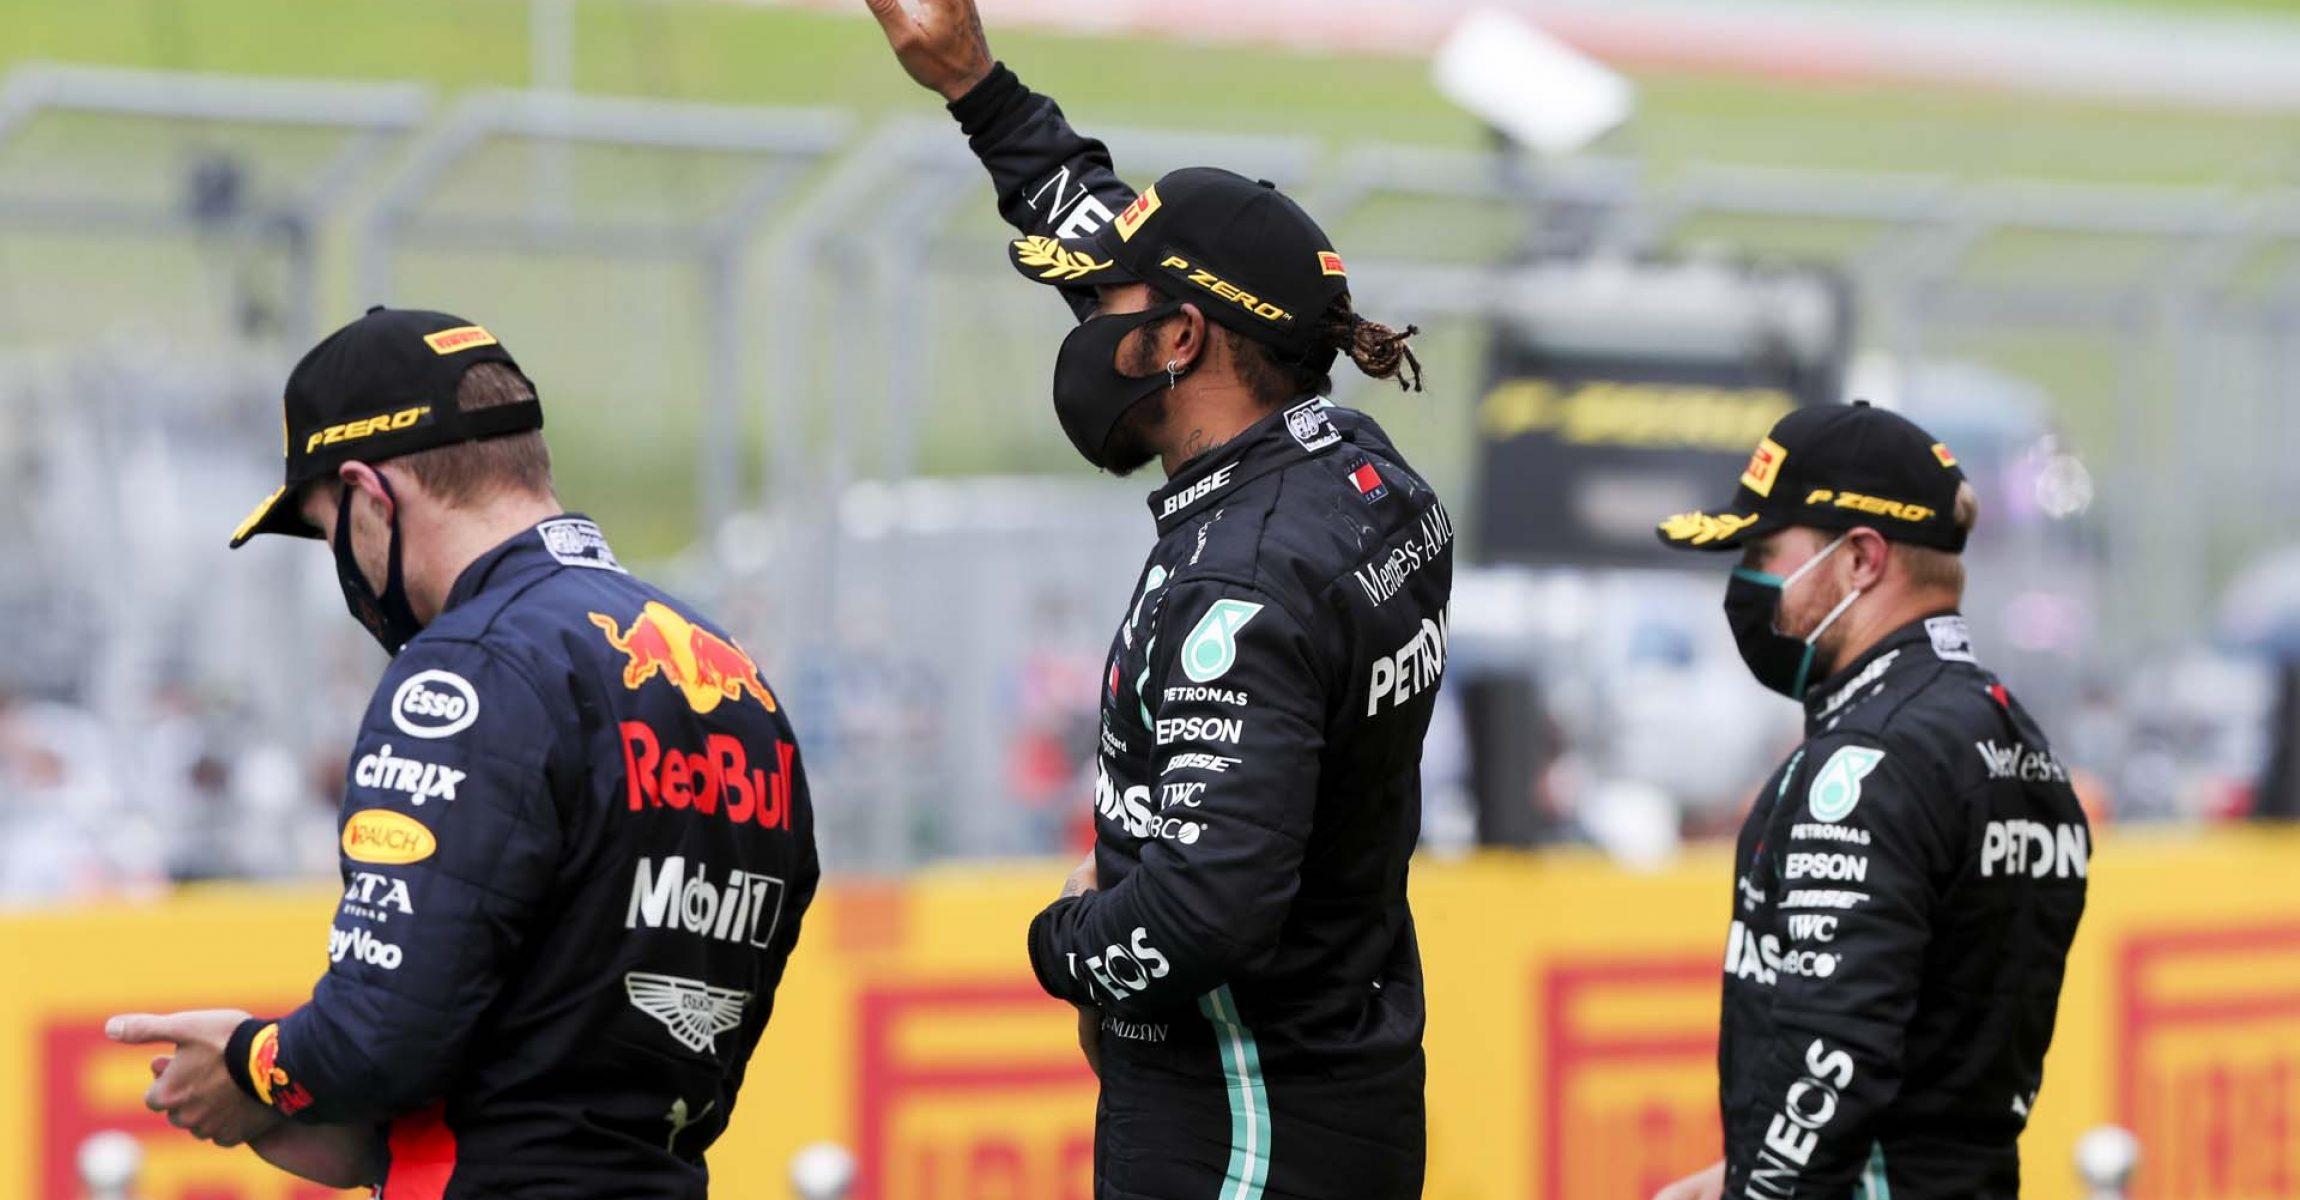 2020 Styrian Grand Prix, Sunday - LAT Images Lewis Hamilton, Valtteri Bottas, Max Verstappen